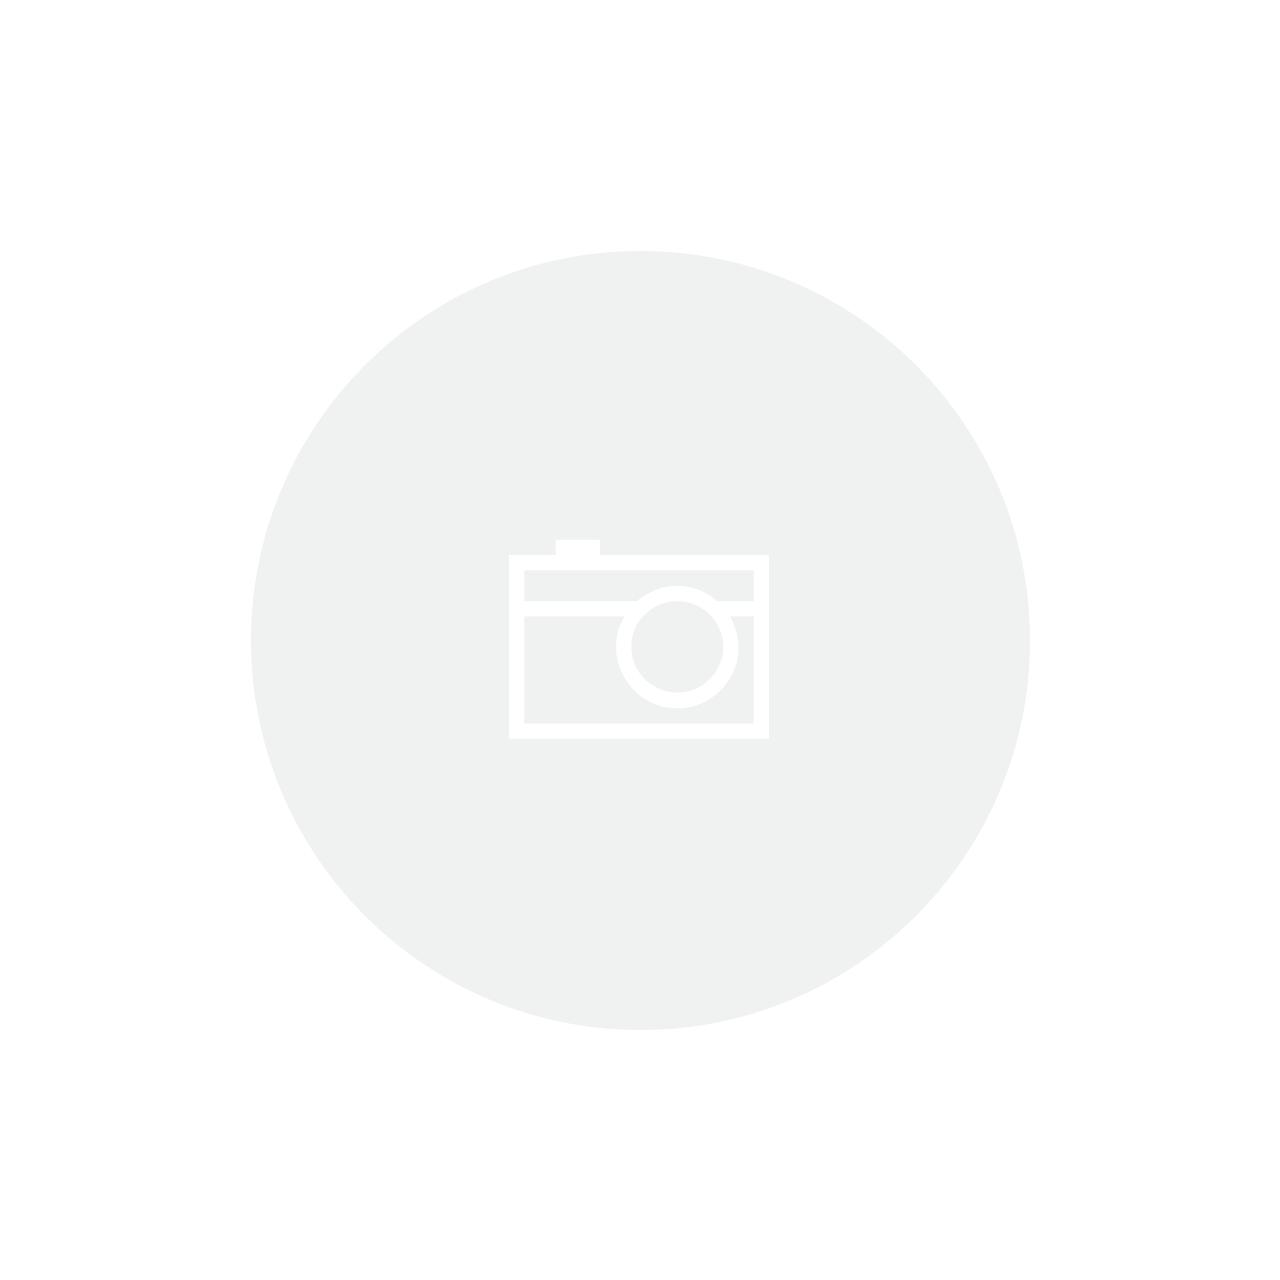 Papel Artesanal Indiano - Ref. 26